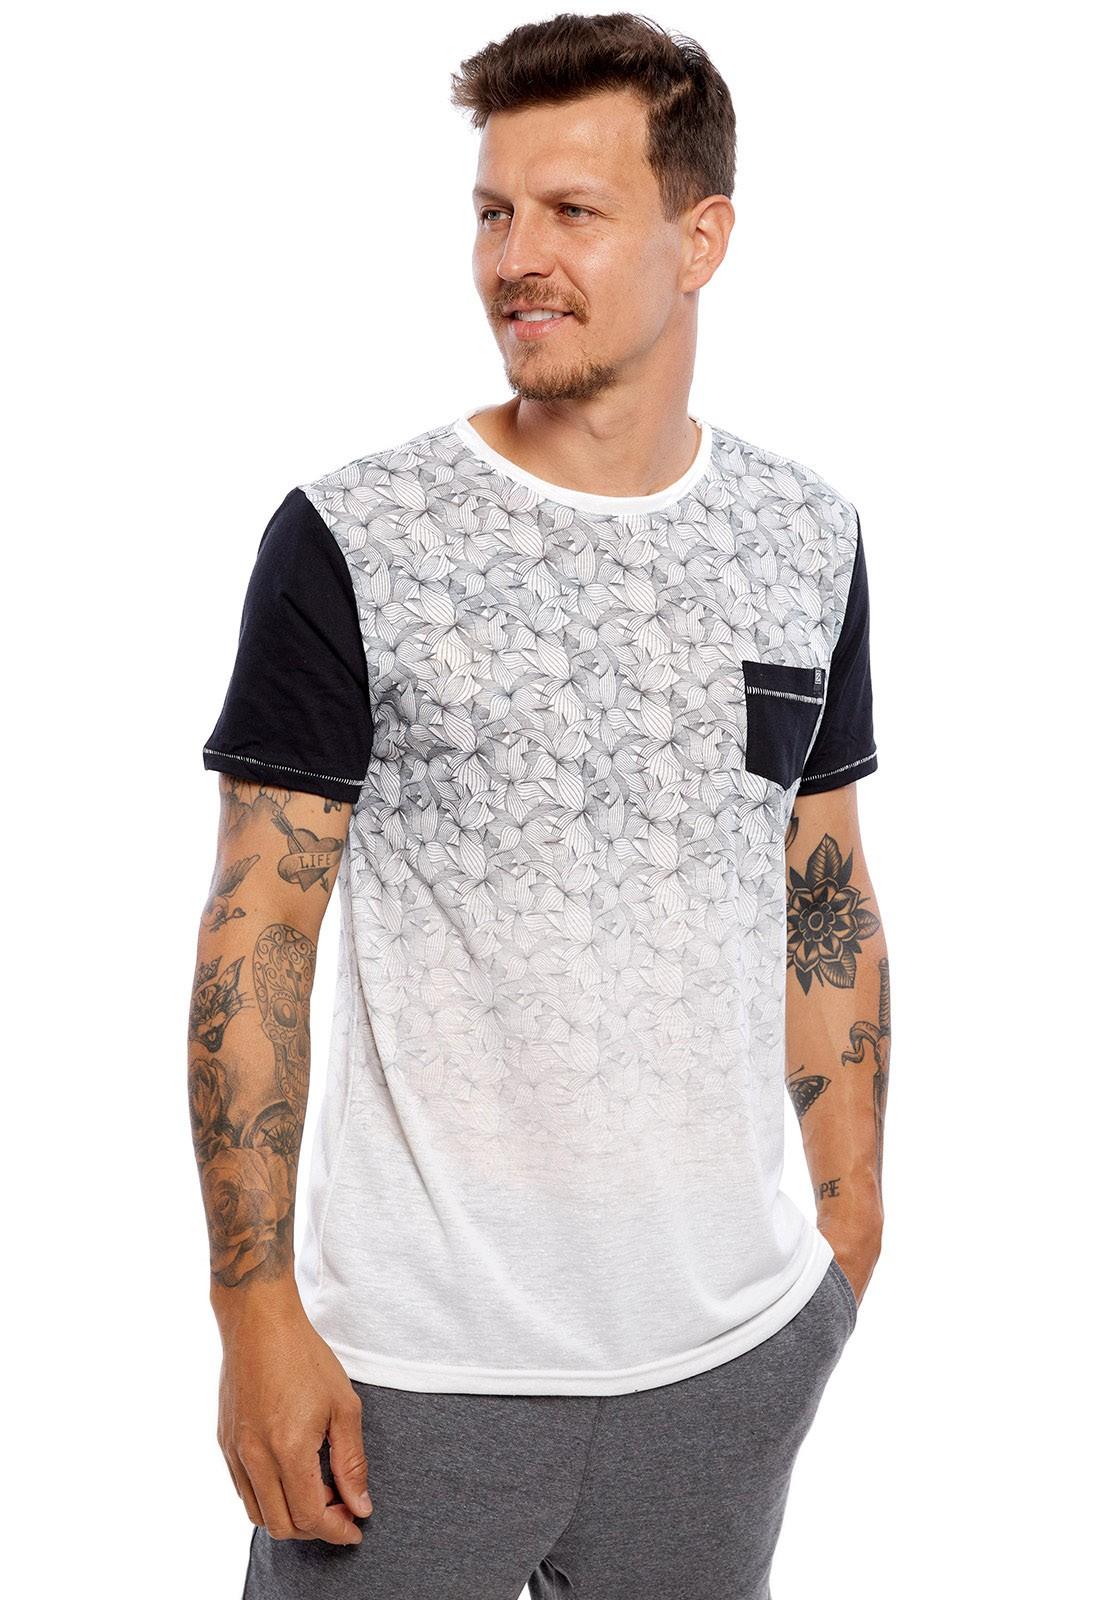 Camiseta Vida Marinha Manga Curta Branco/Preto